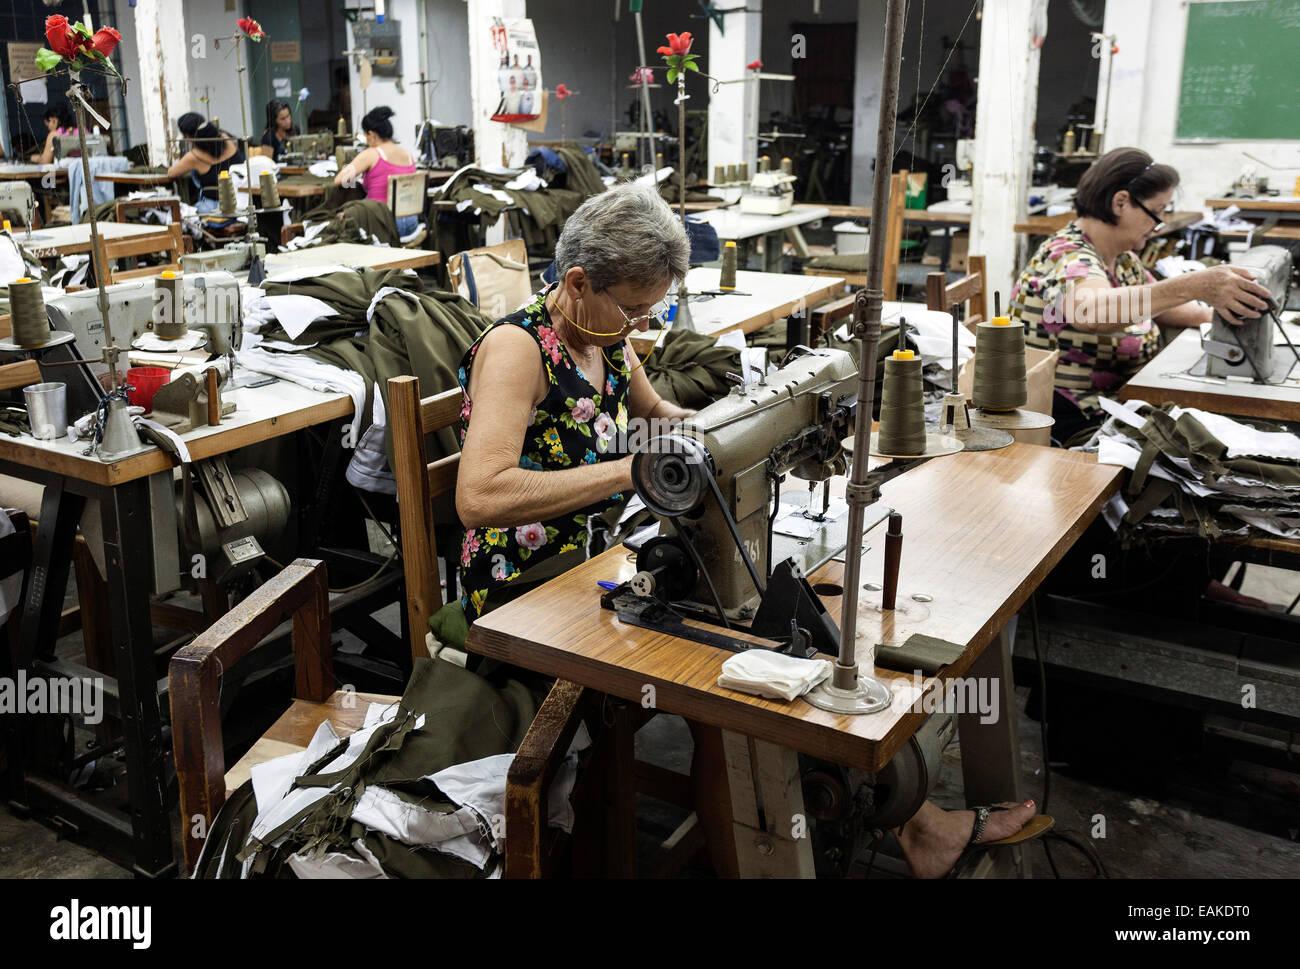 Seamstresses in a clothing factory, Viñales, Cuba - Stock Image